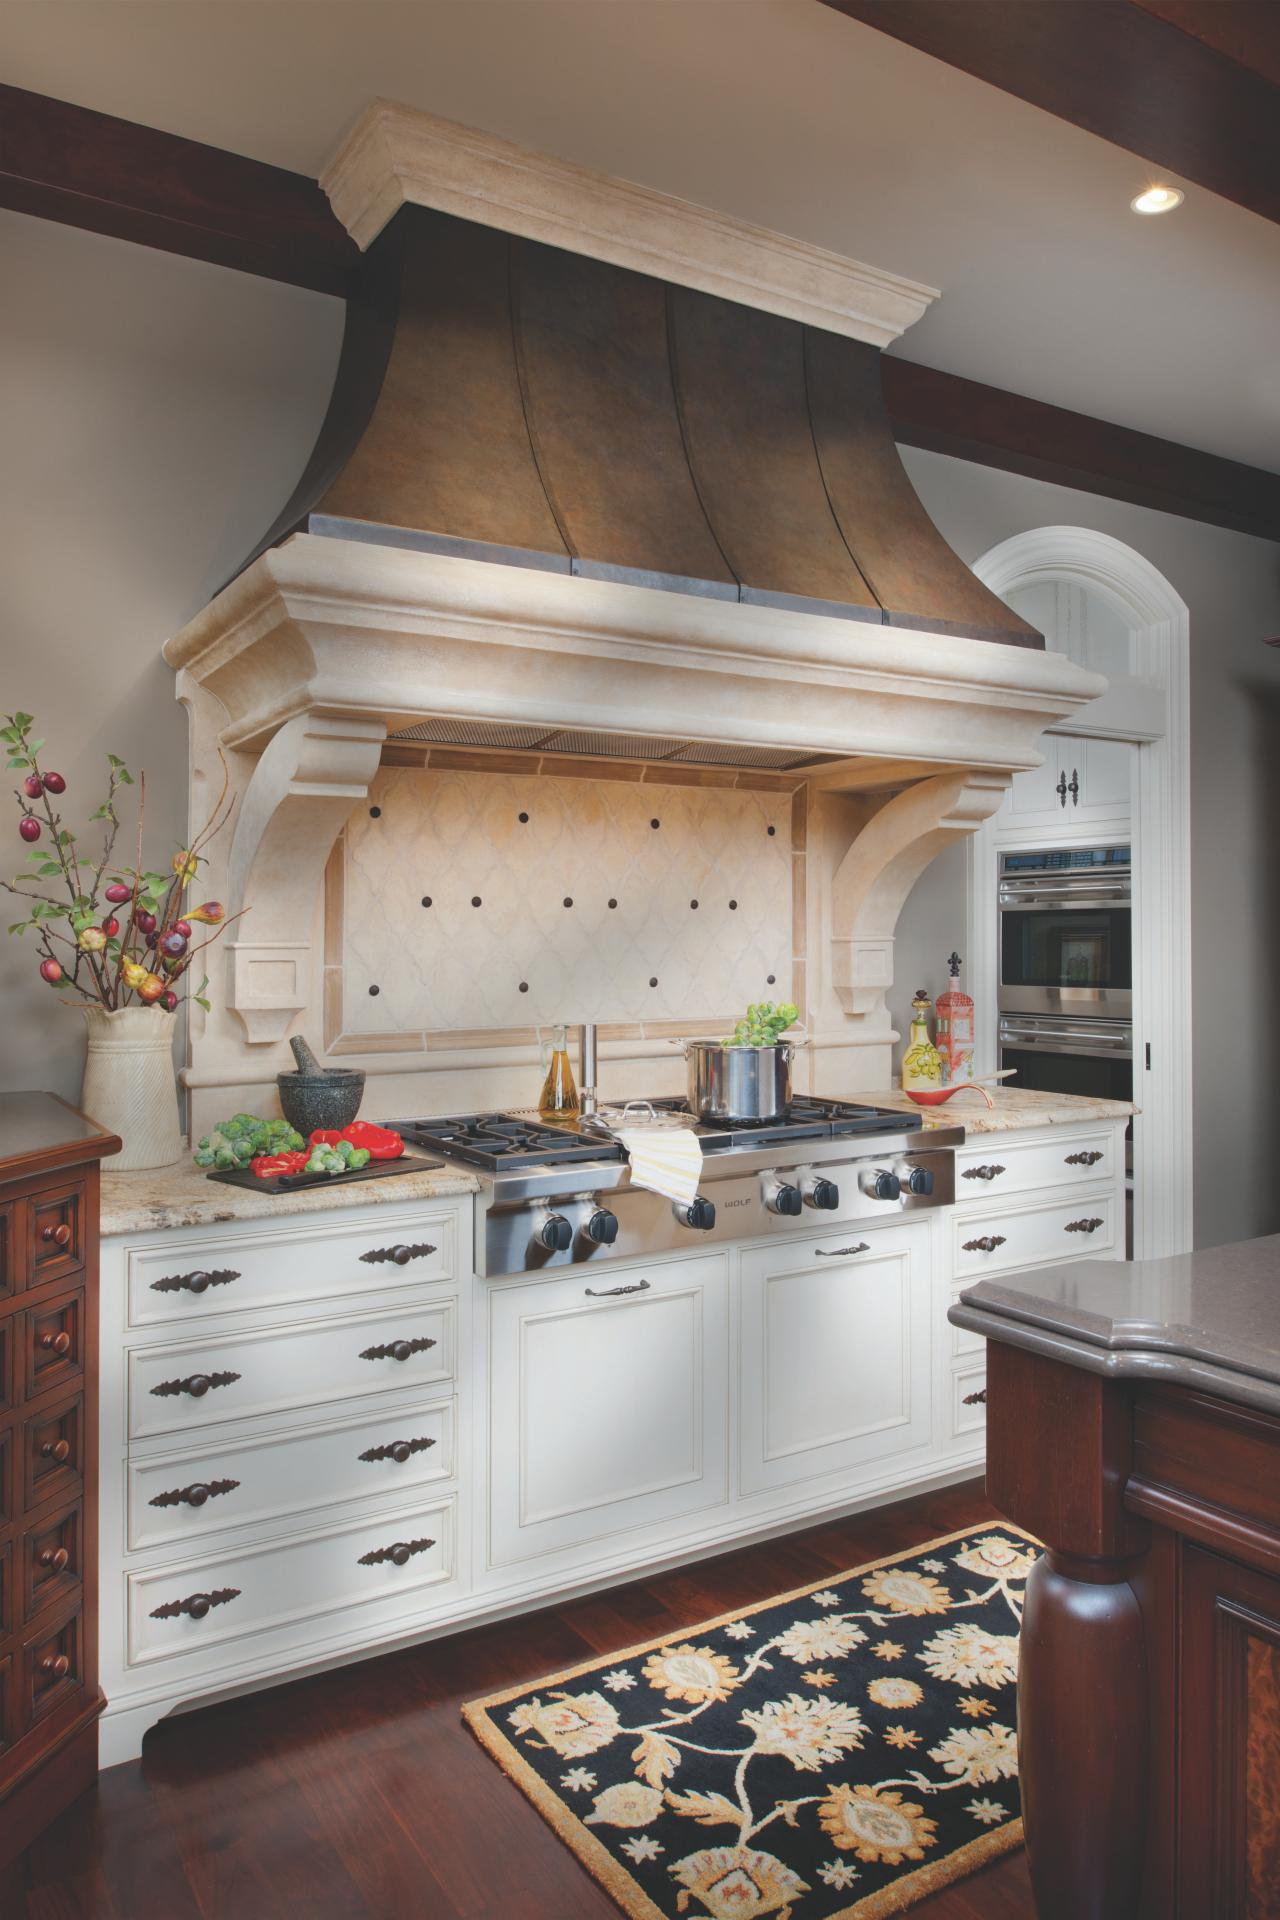 2016 NKBA Kitchen Trends